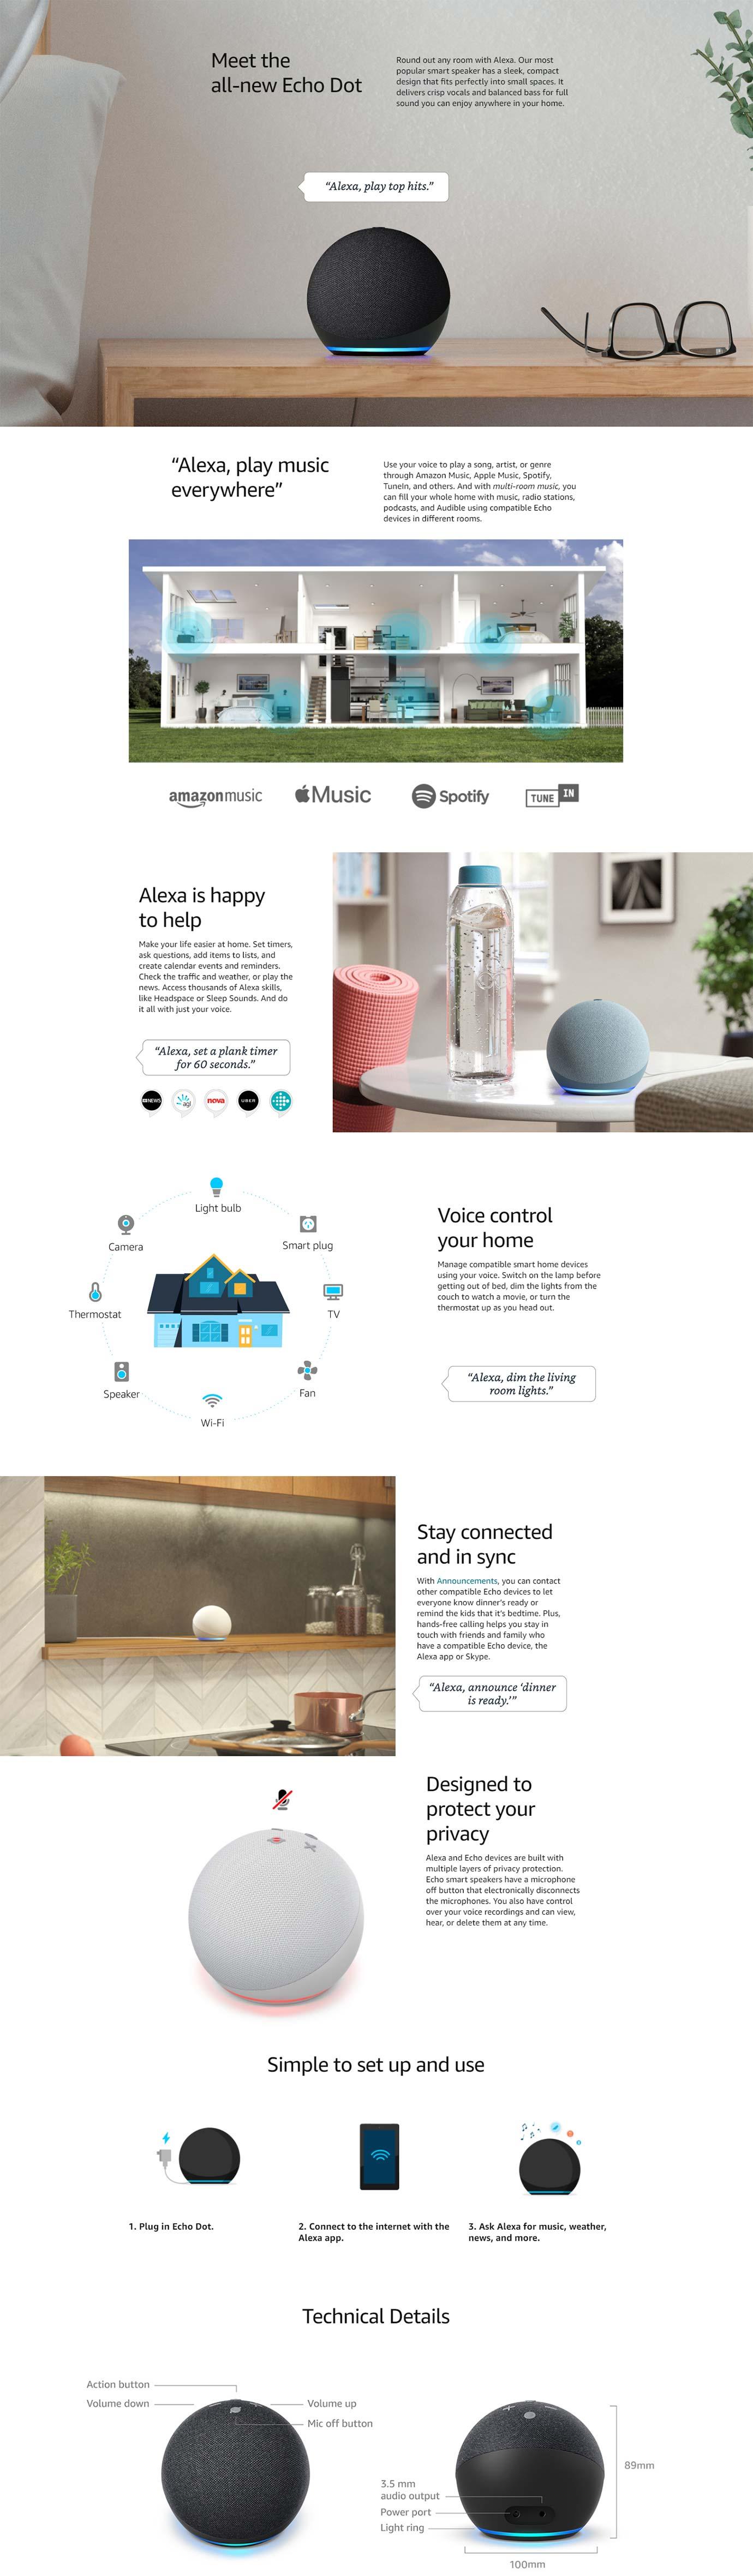 Amazon Echo Dot with Alexa (Gen 4)